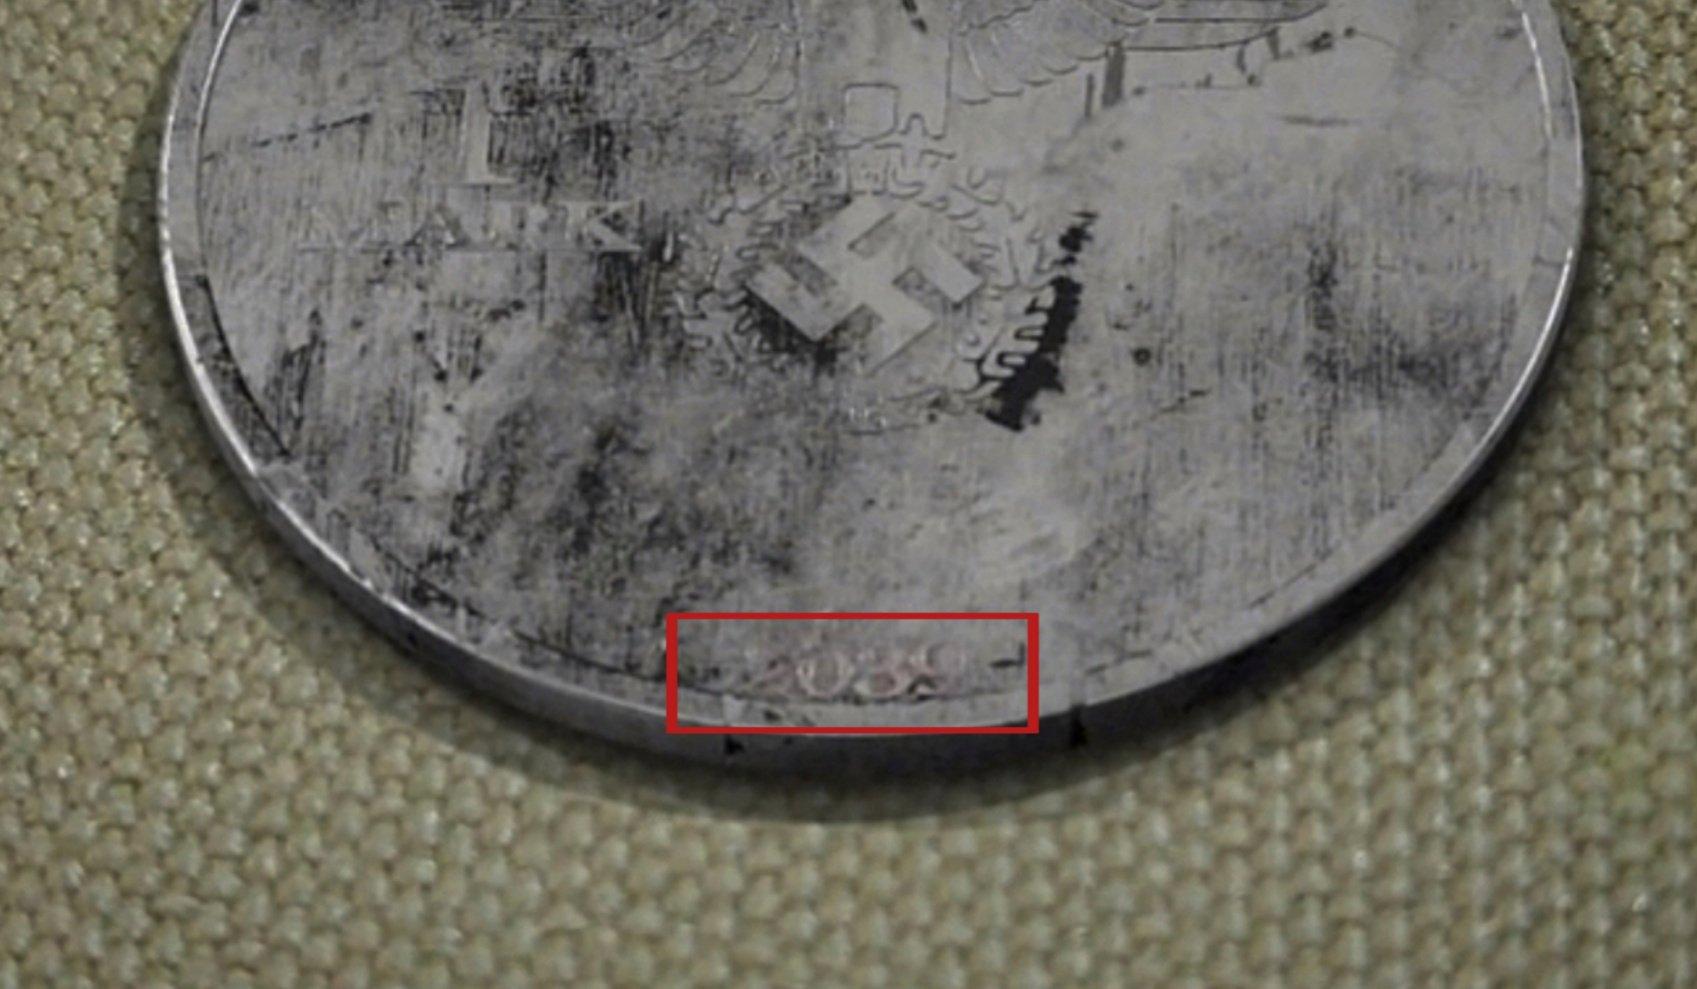 The nazi coin